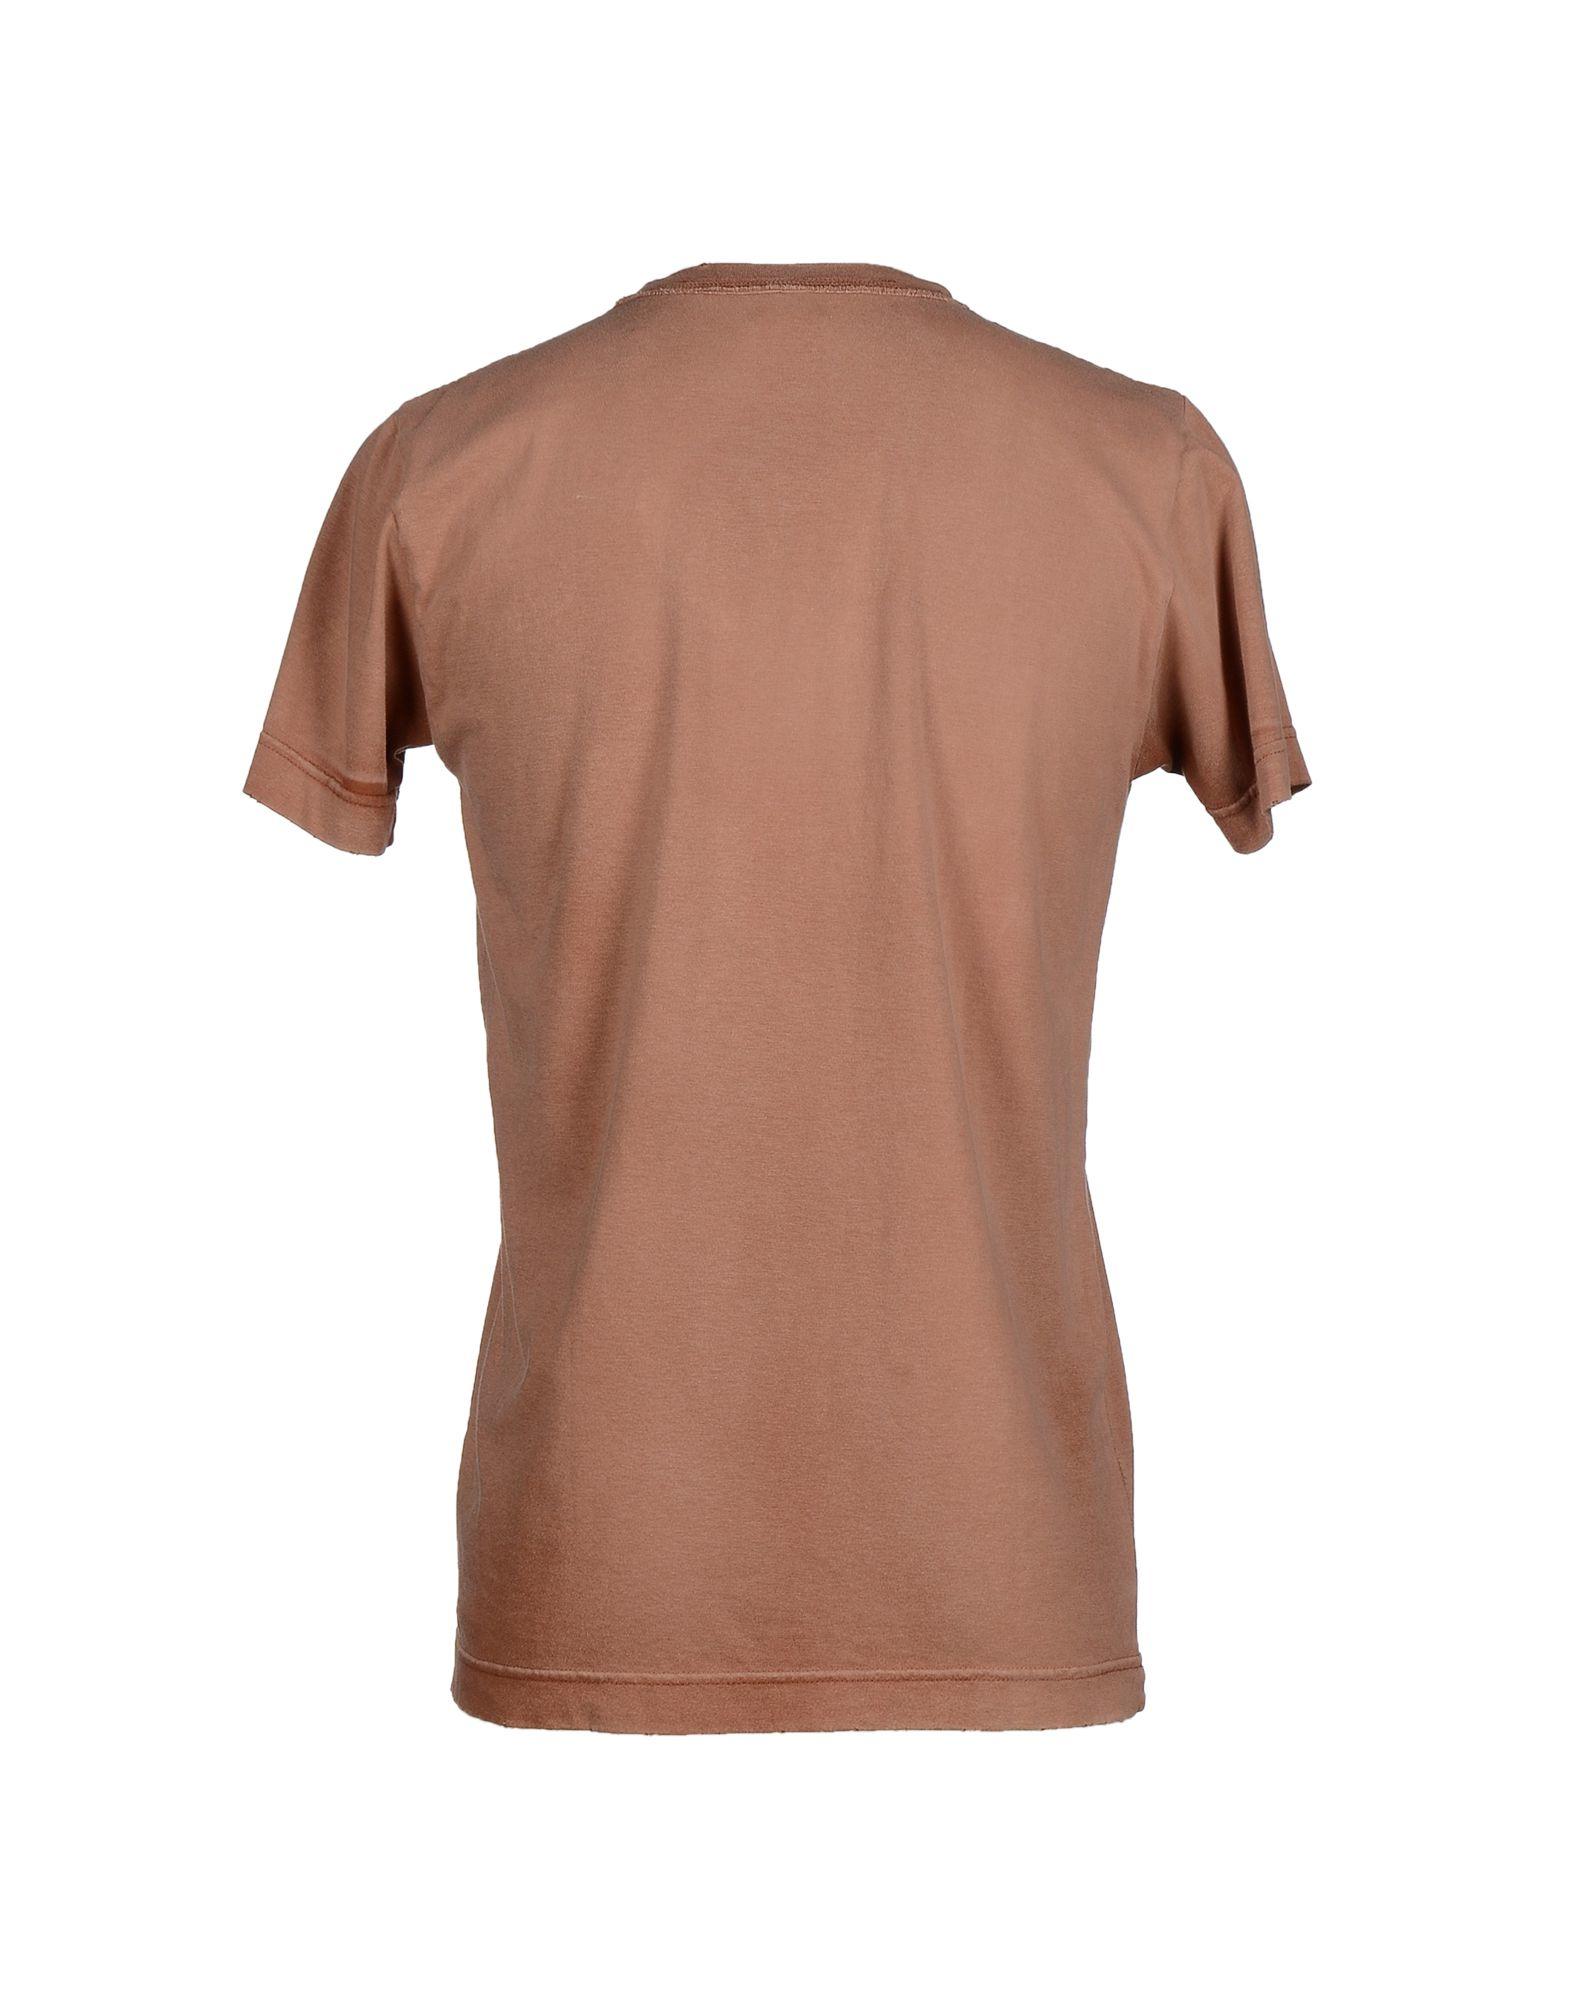 balmain t shirt in brown for men lyst. Black Bedroom Furniture Sets. Home Design Ideas